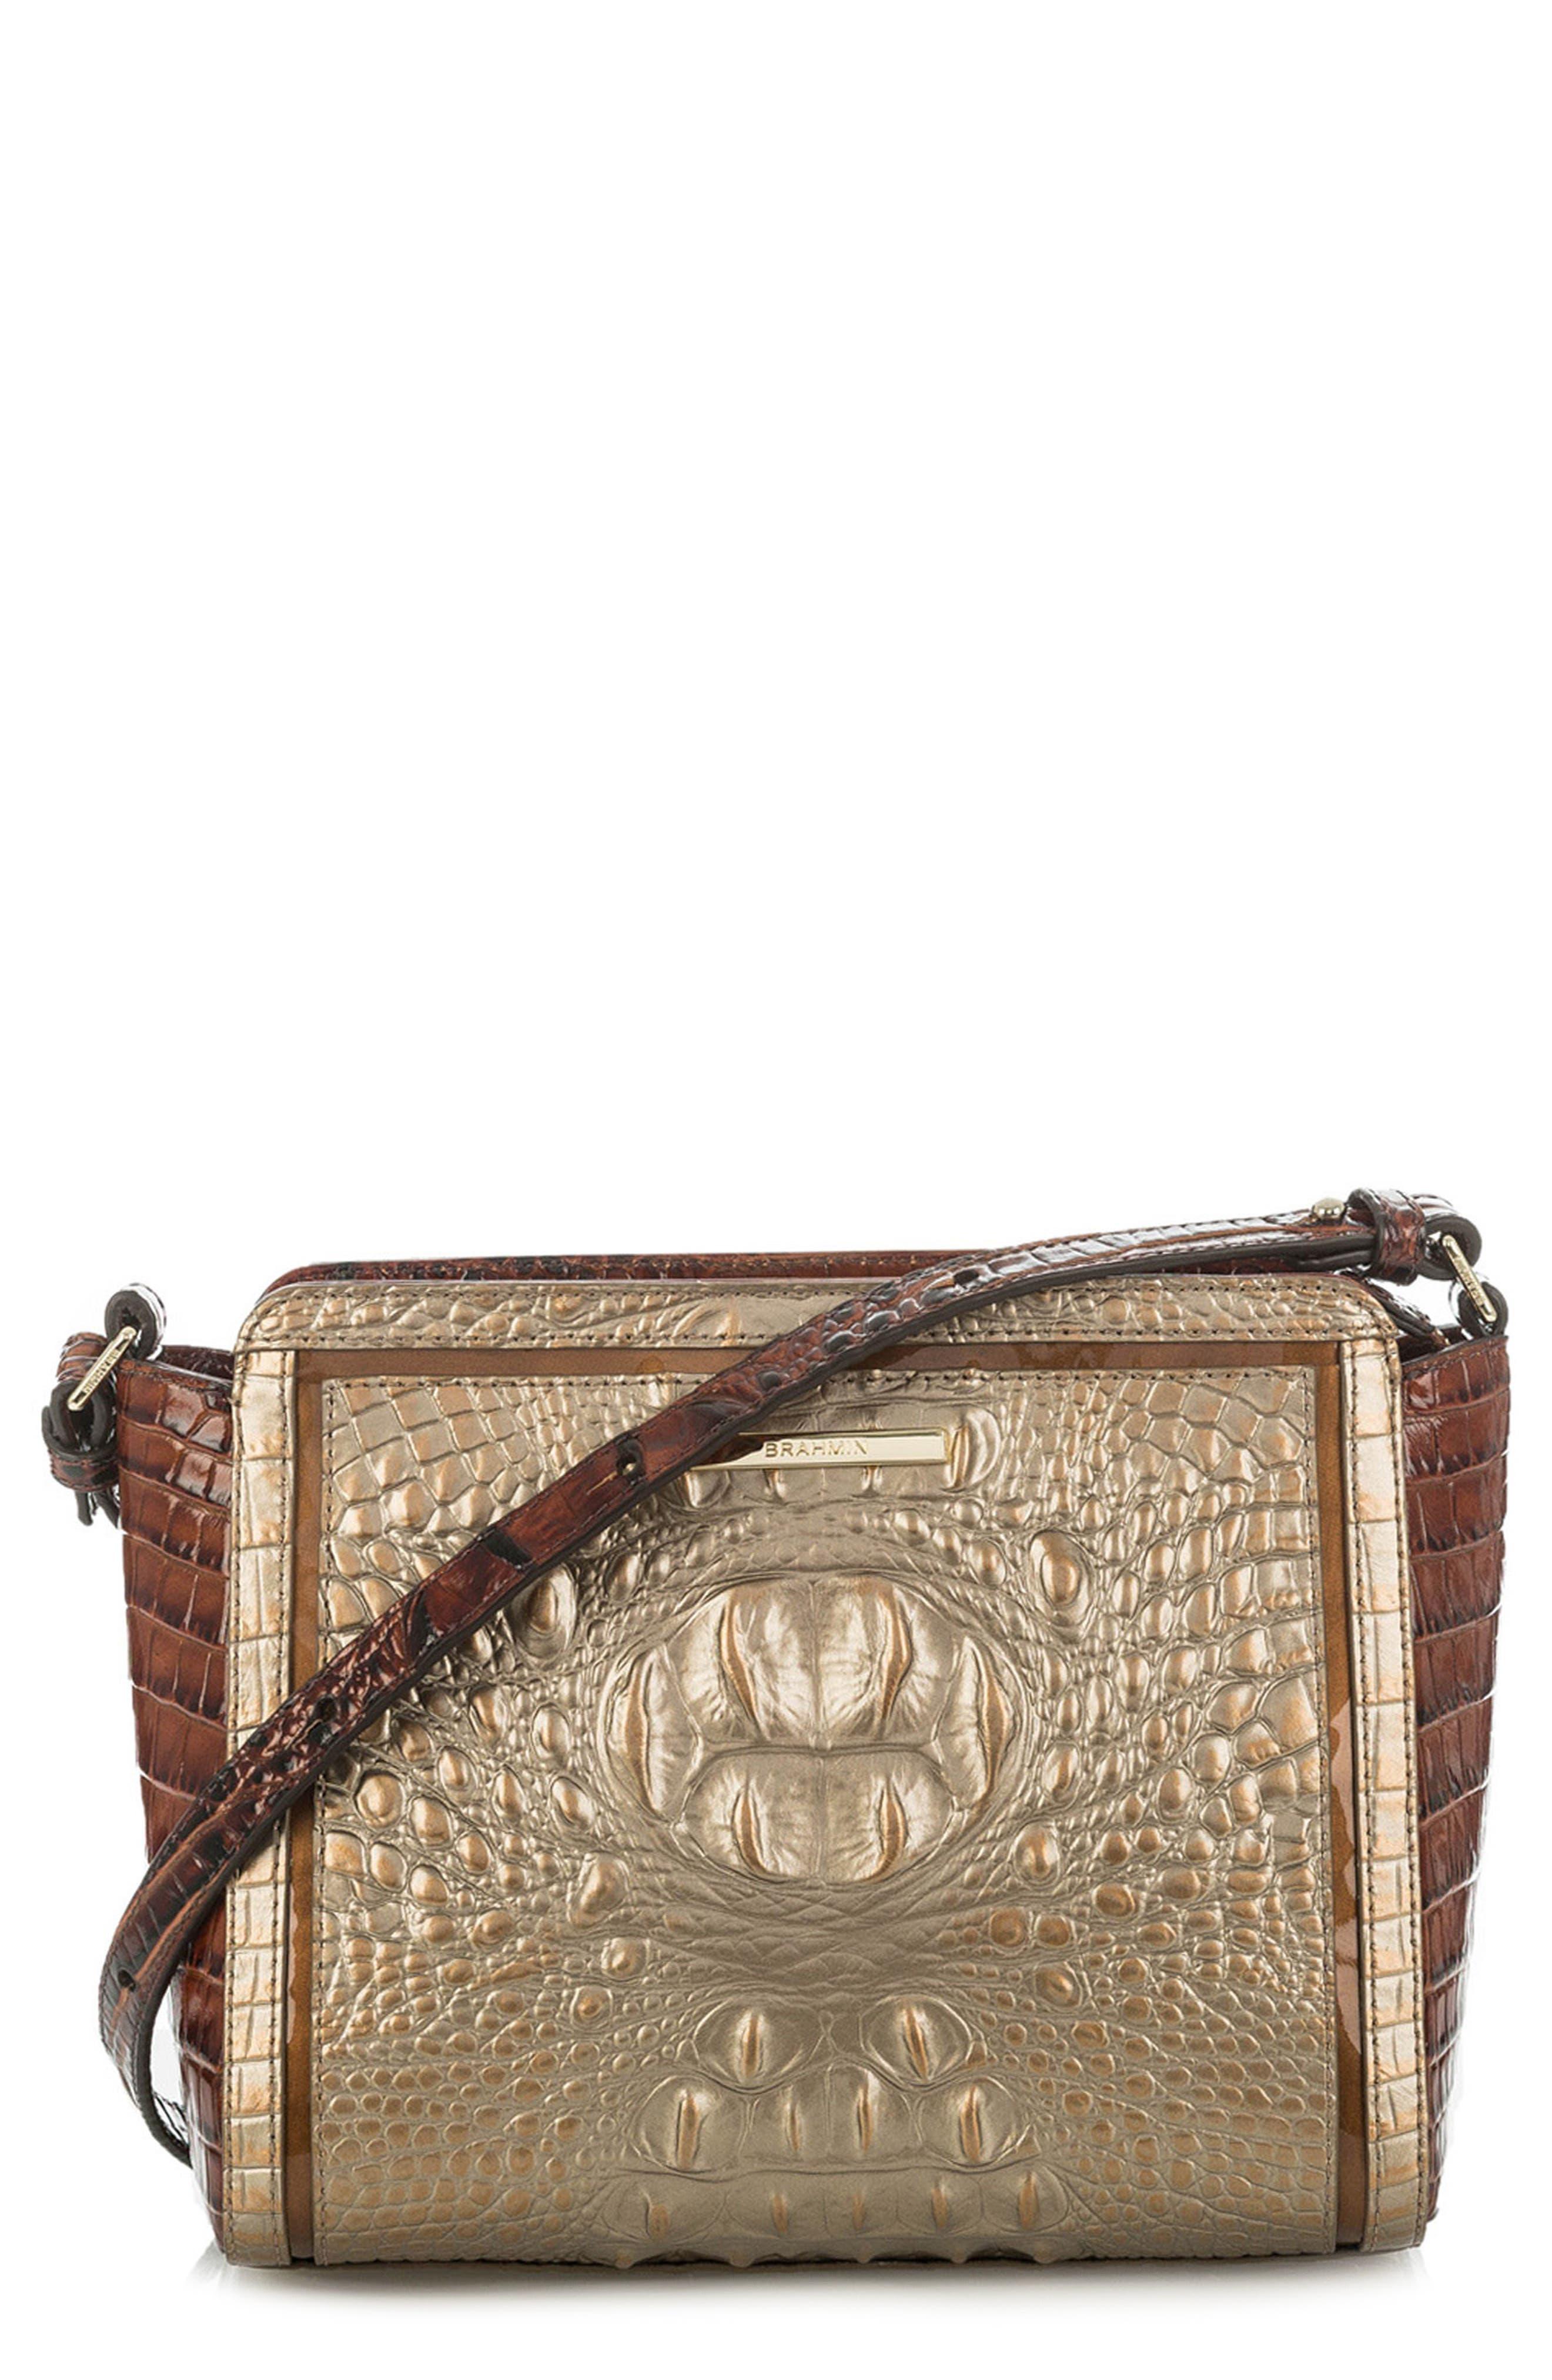 Main Image - Brahmin Carrie Croc-Embossed Leather Crossbody Bag